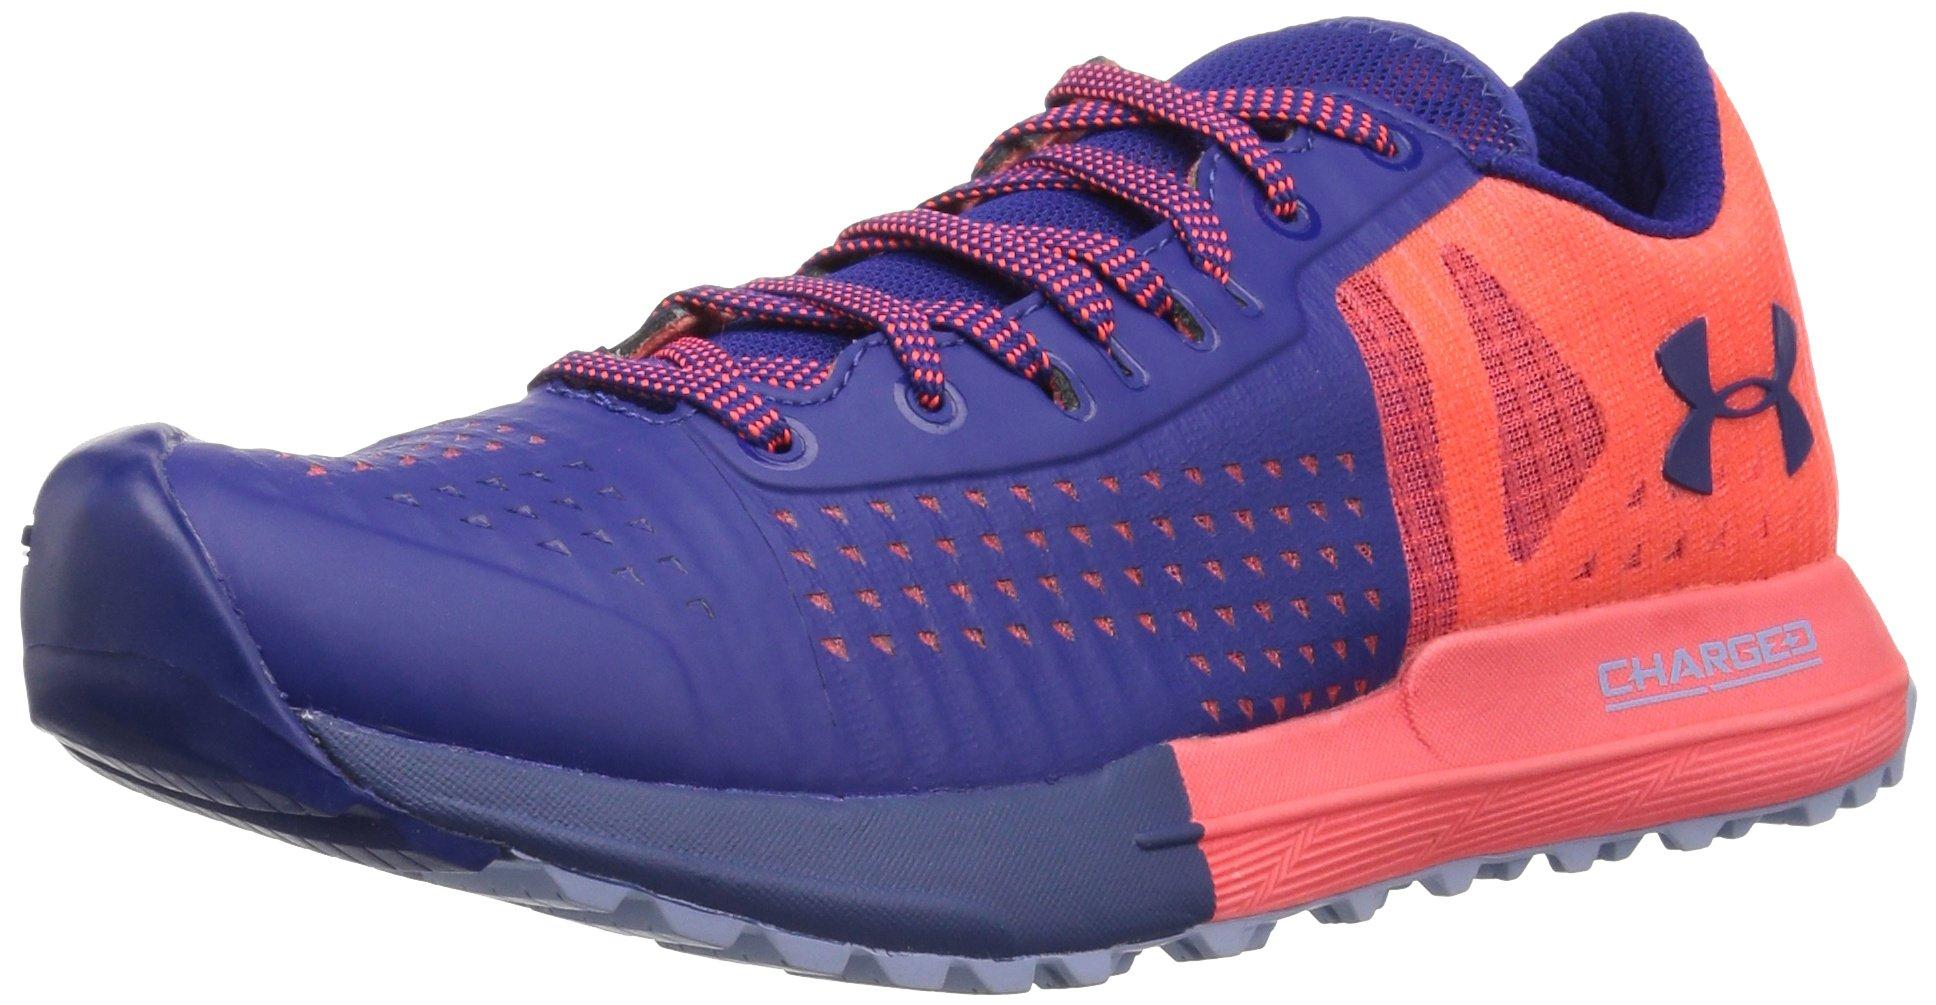 Under Armour Women's Horizon Ktv Running Shoe, Neon Coral (601)/Formation Blue, 8.5